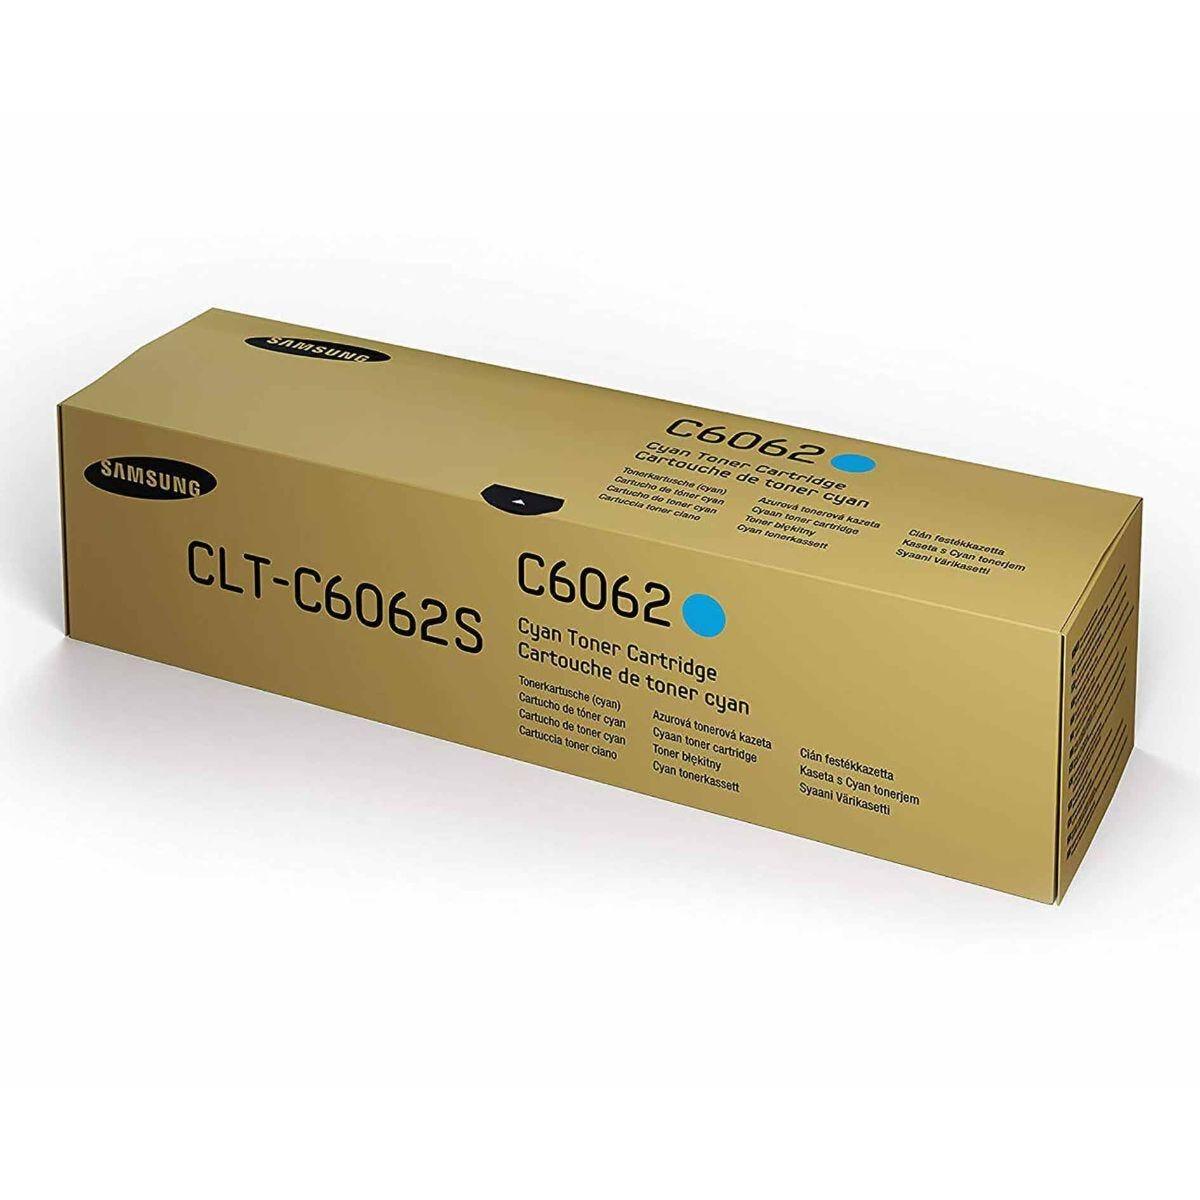 Samsung CLX9350ND Series Cyan